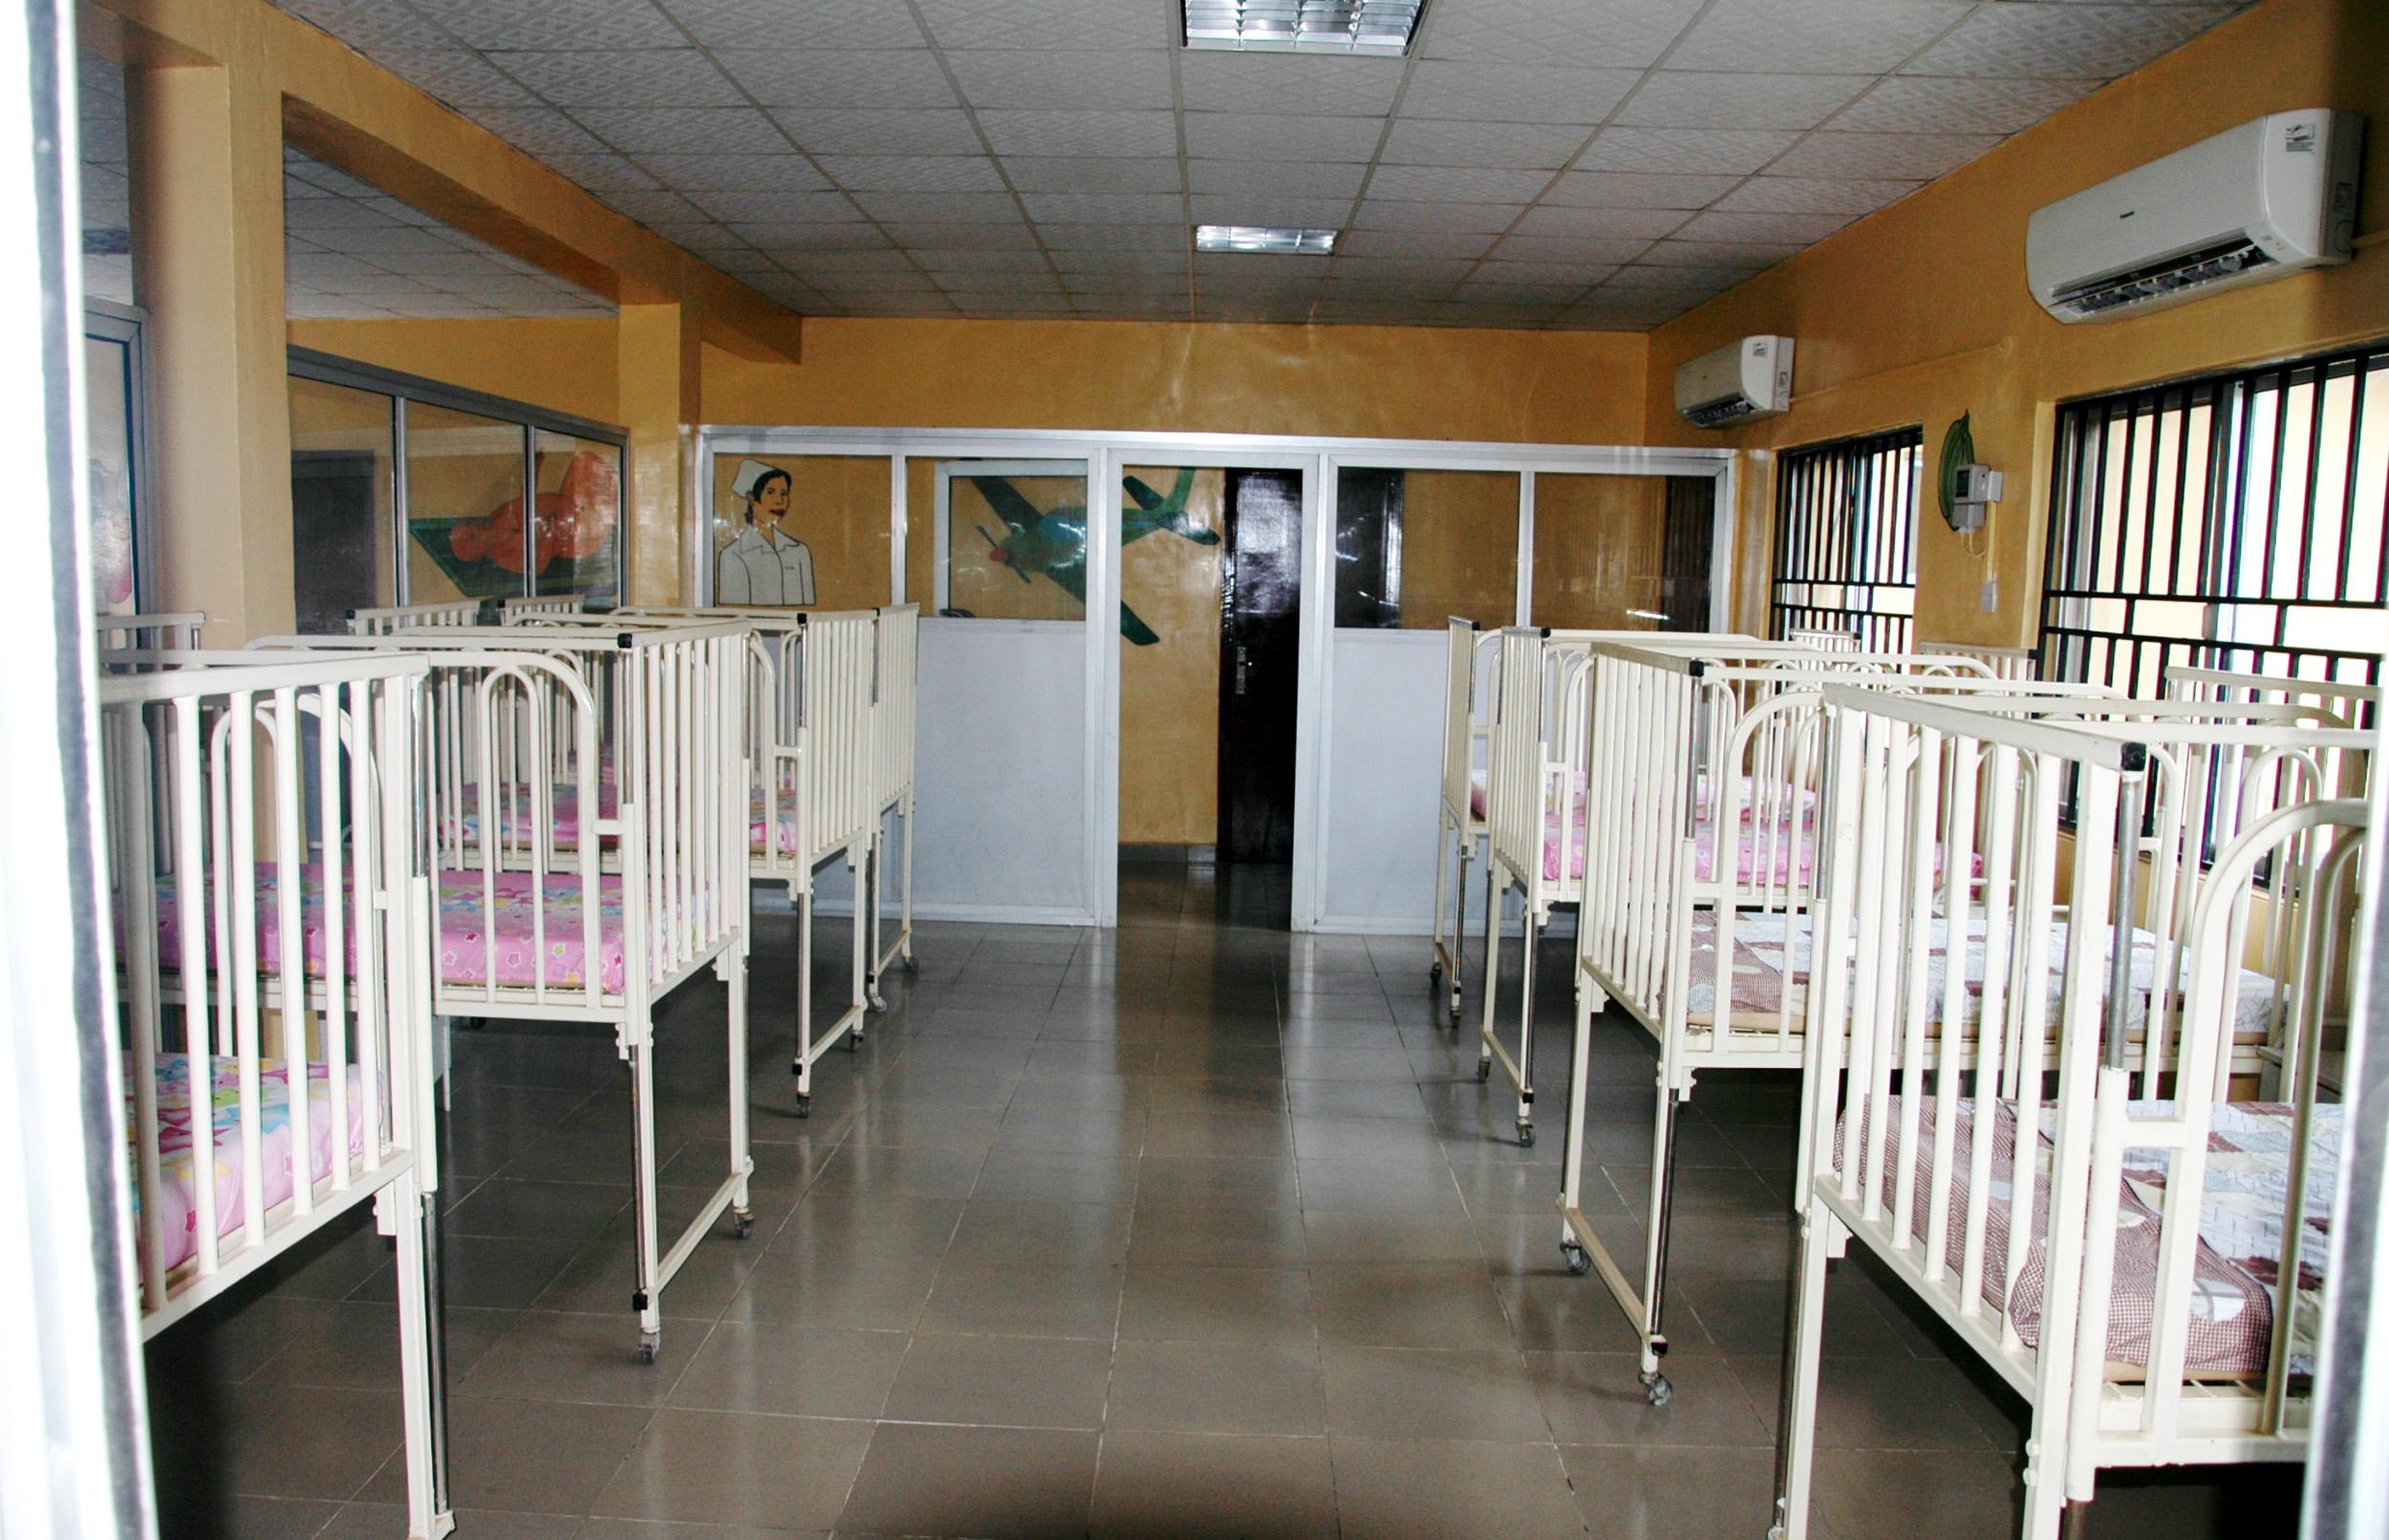 PIC. 16. THE PAEDIATRIC WARD INAUGURATED AT THE GENERAL HOSPITAL, AGBALA IN IKORODU, LAGOS STATE ON THURSDAY (17/9/15). 6684/17/9/2015/BOA/BJO/NAN